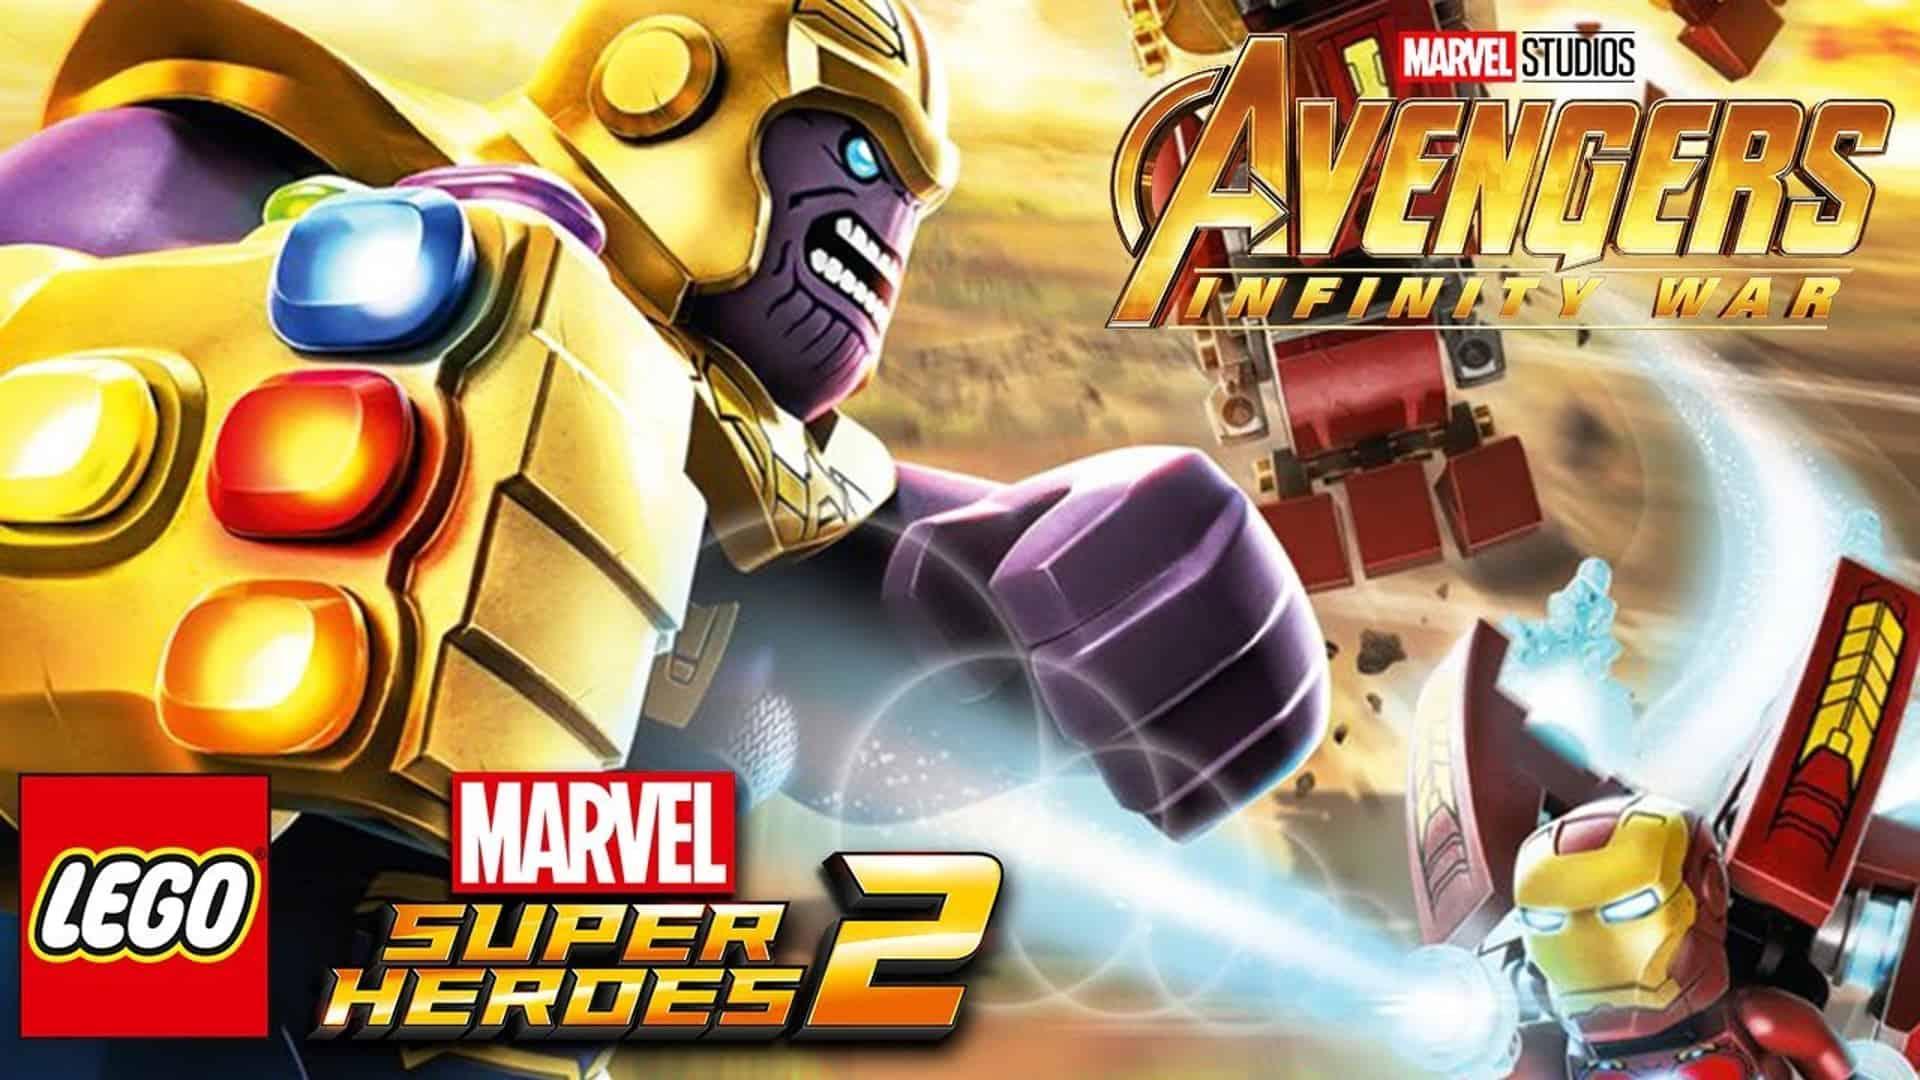 LEGO Marvel Superheroes 2 Avengers: Infinity War DLC announced